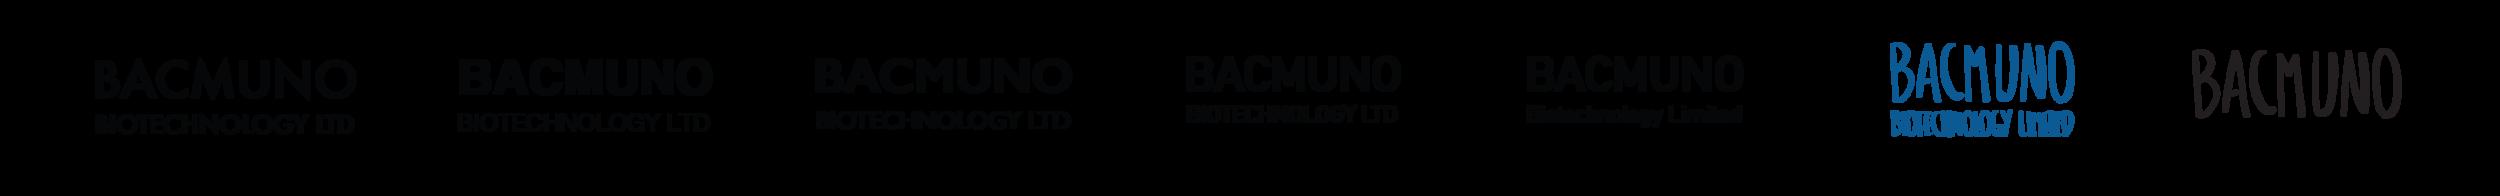 Bacmuno Process-03.png